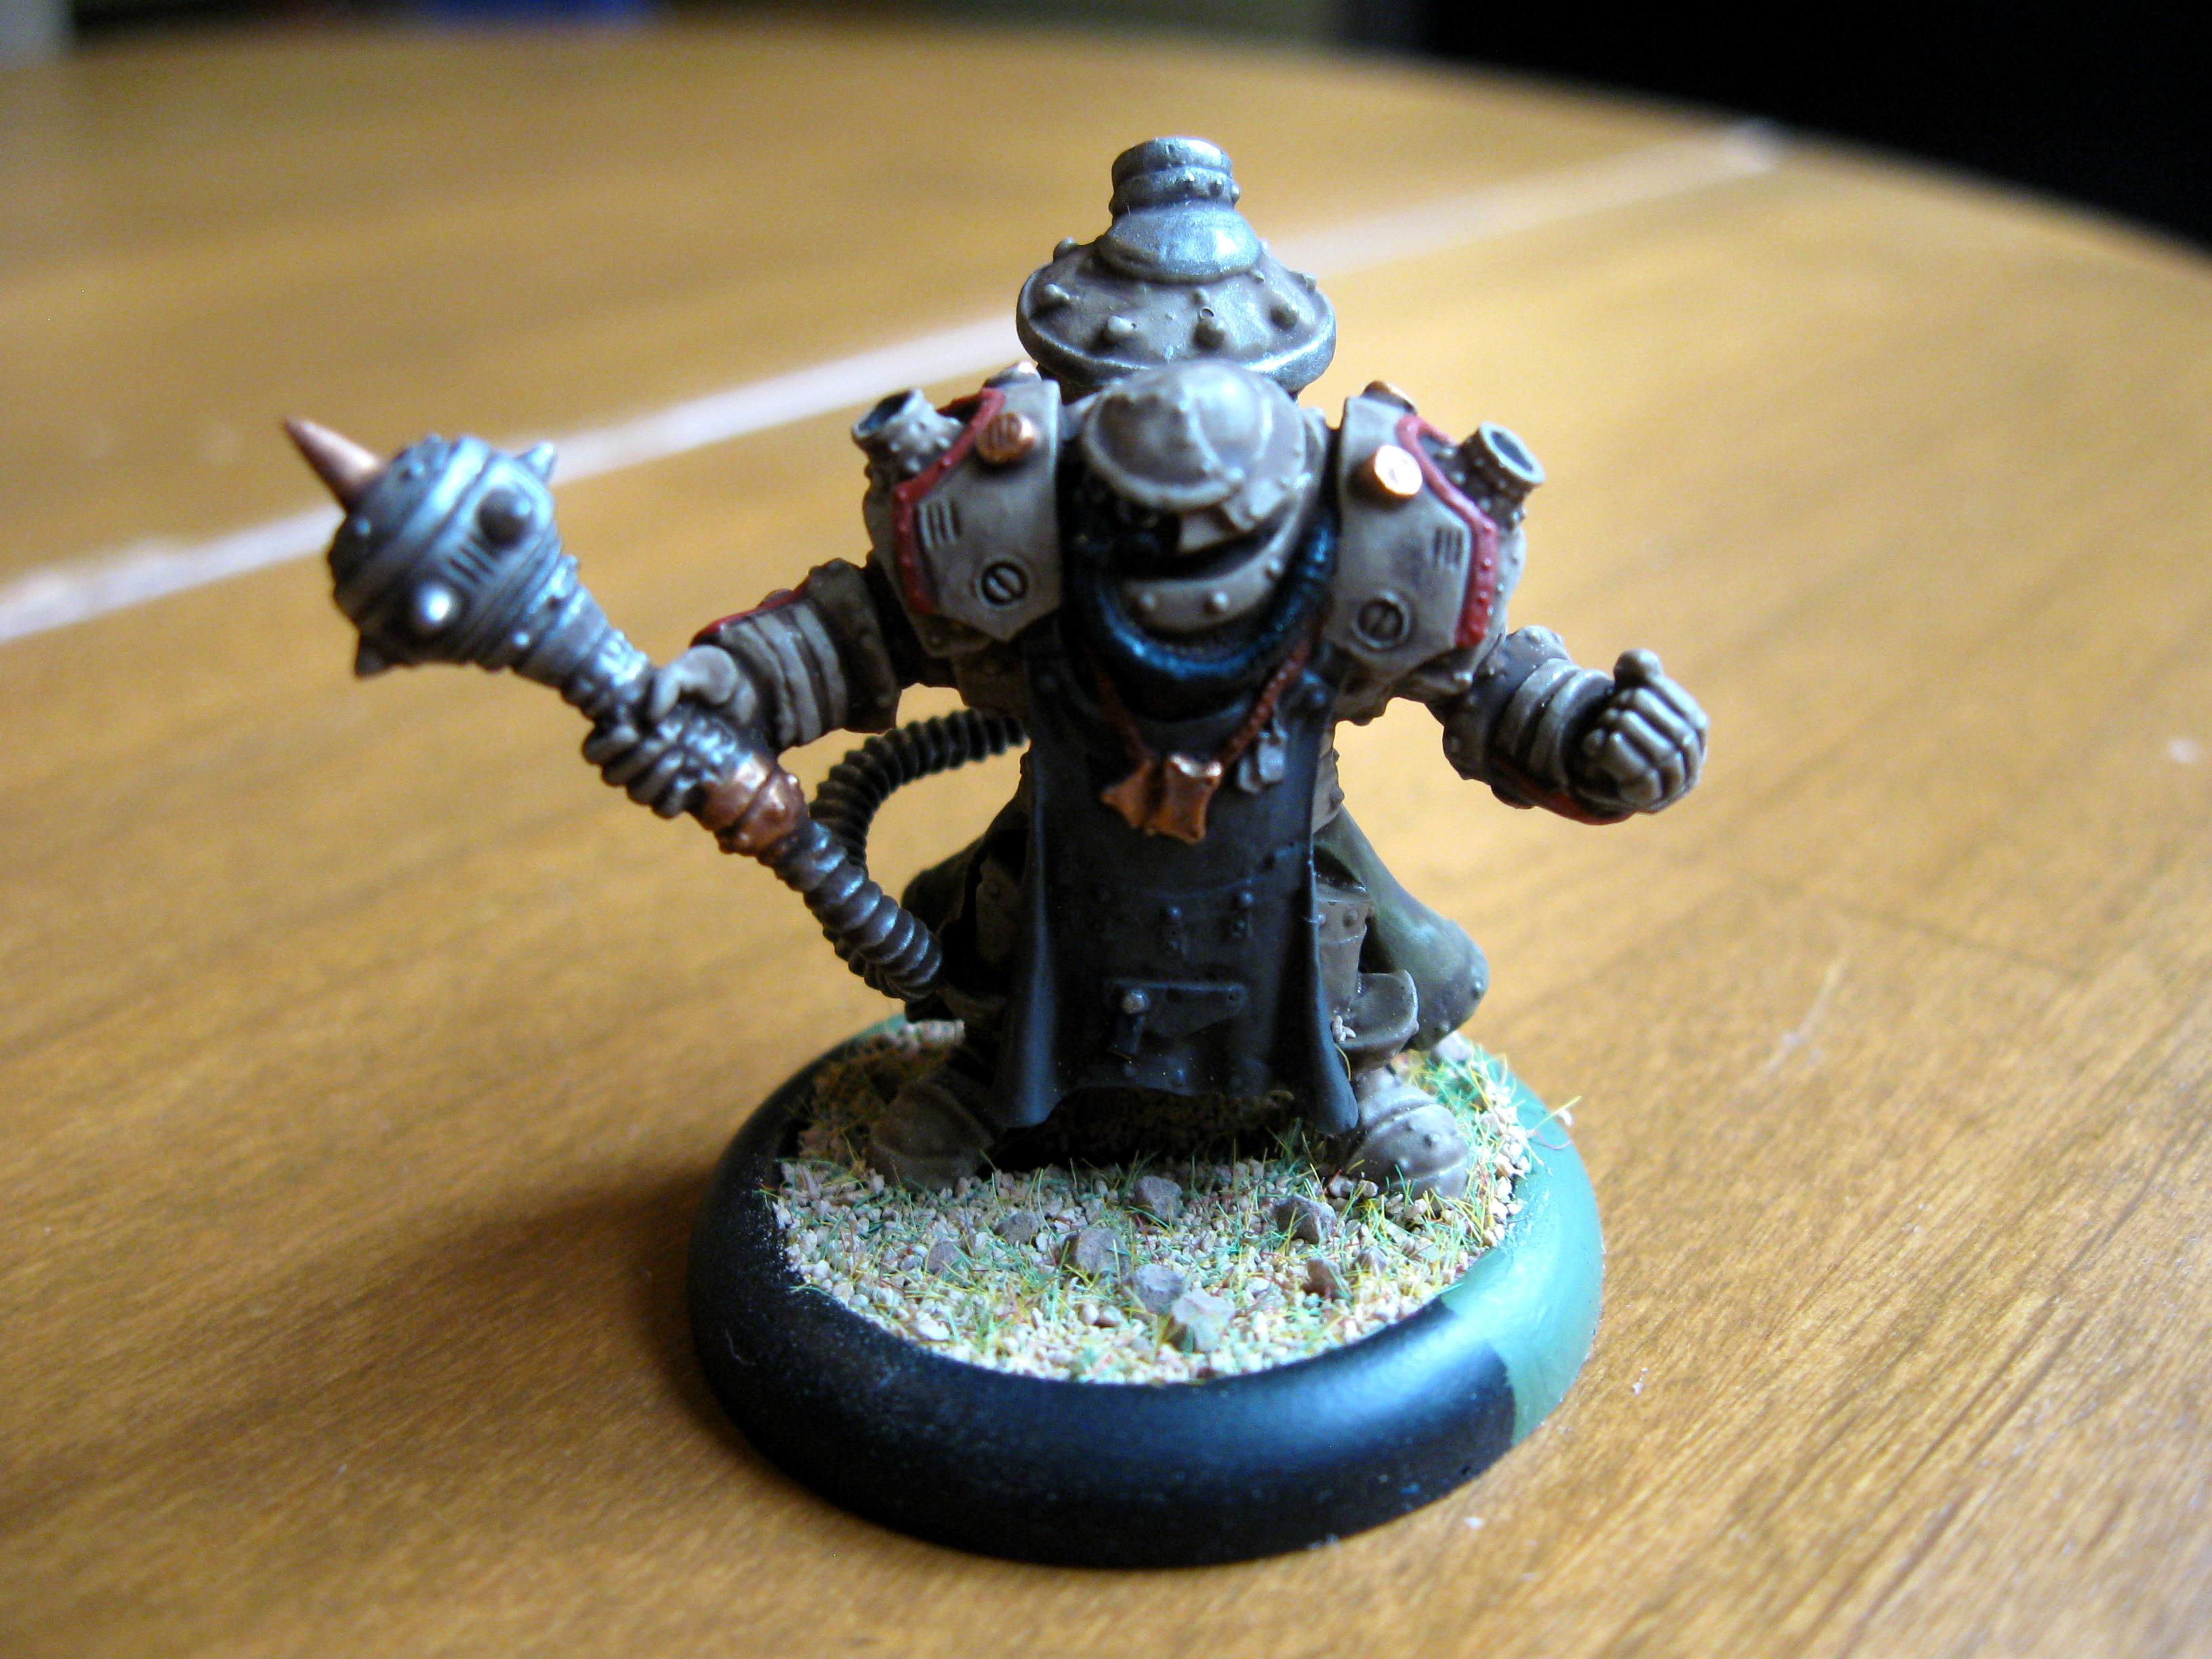 Dwarves, Mercenary, Privateer Press, Rhulic, Searforge, Warmachine